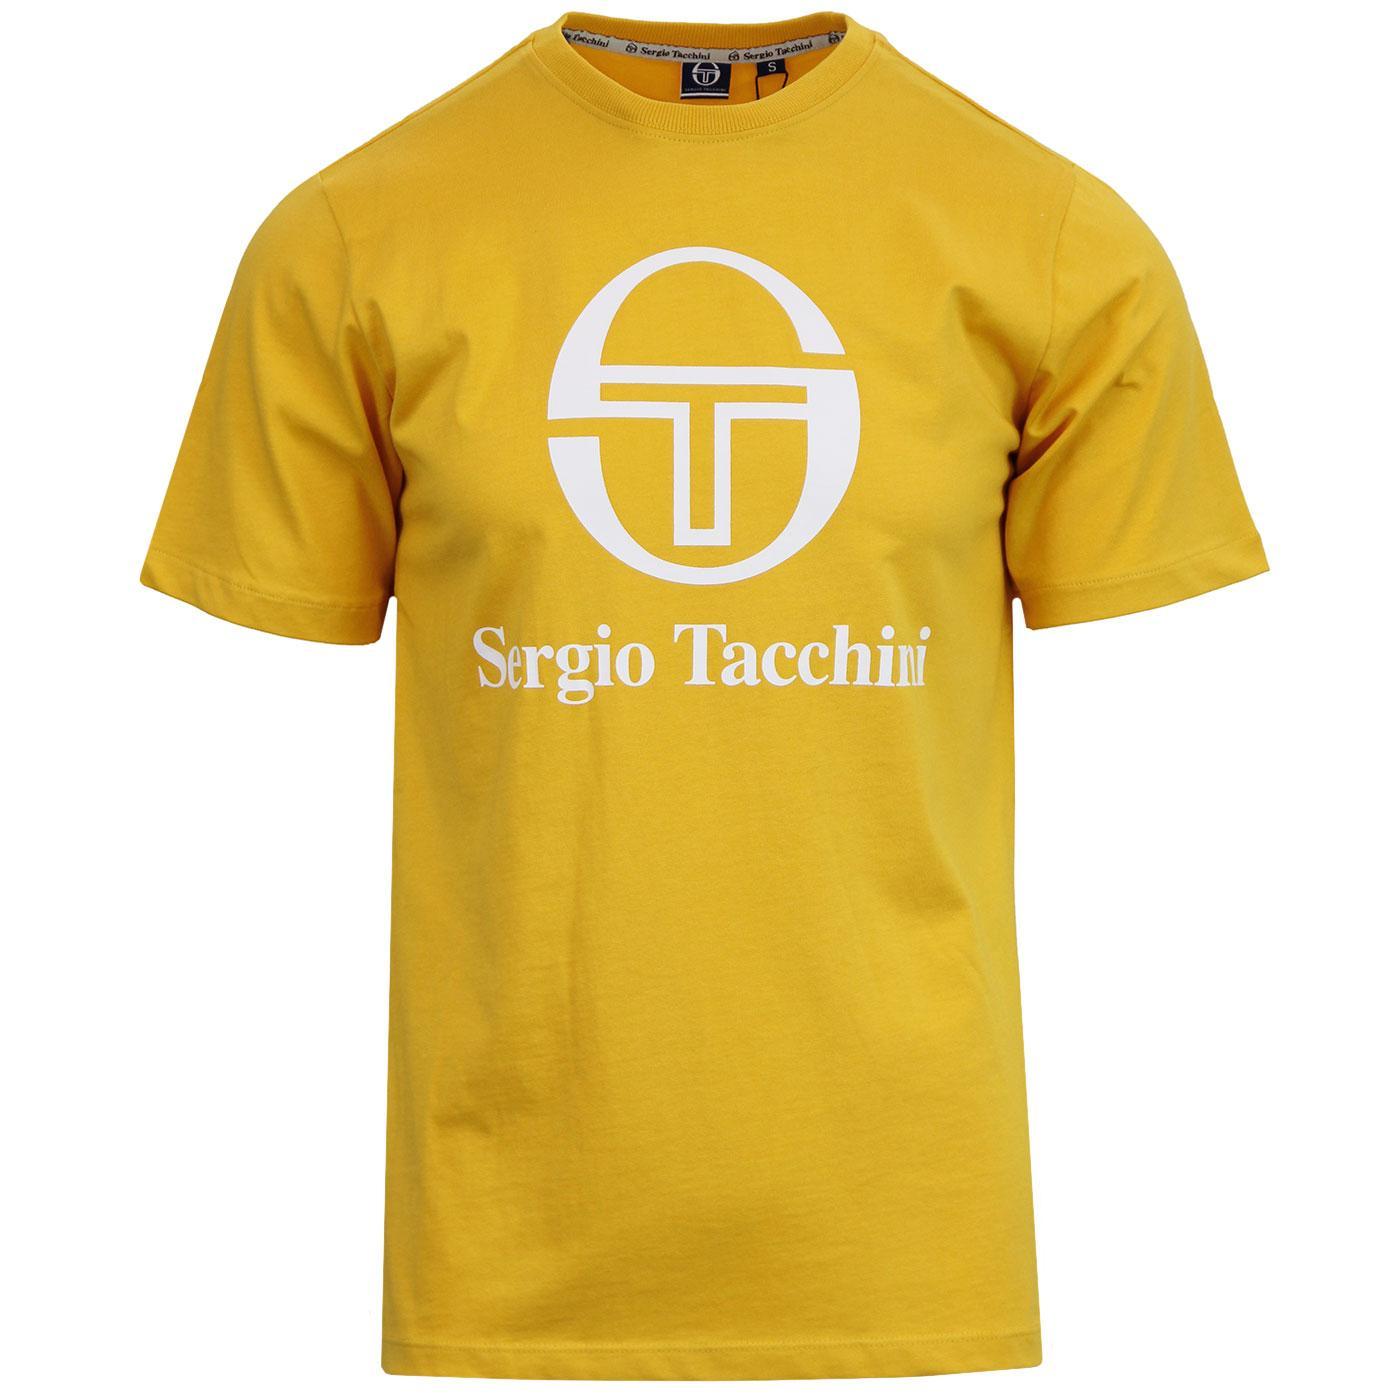 Chiko SERGIO TACCHINI Retro 80s Logo Tee (Mustard)